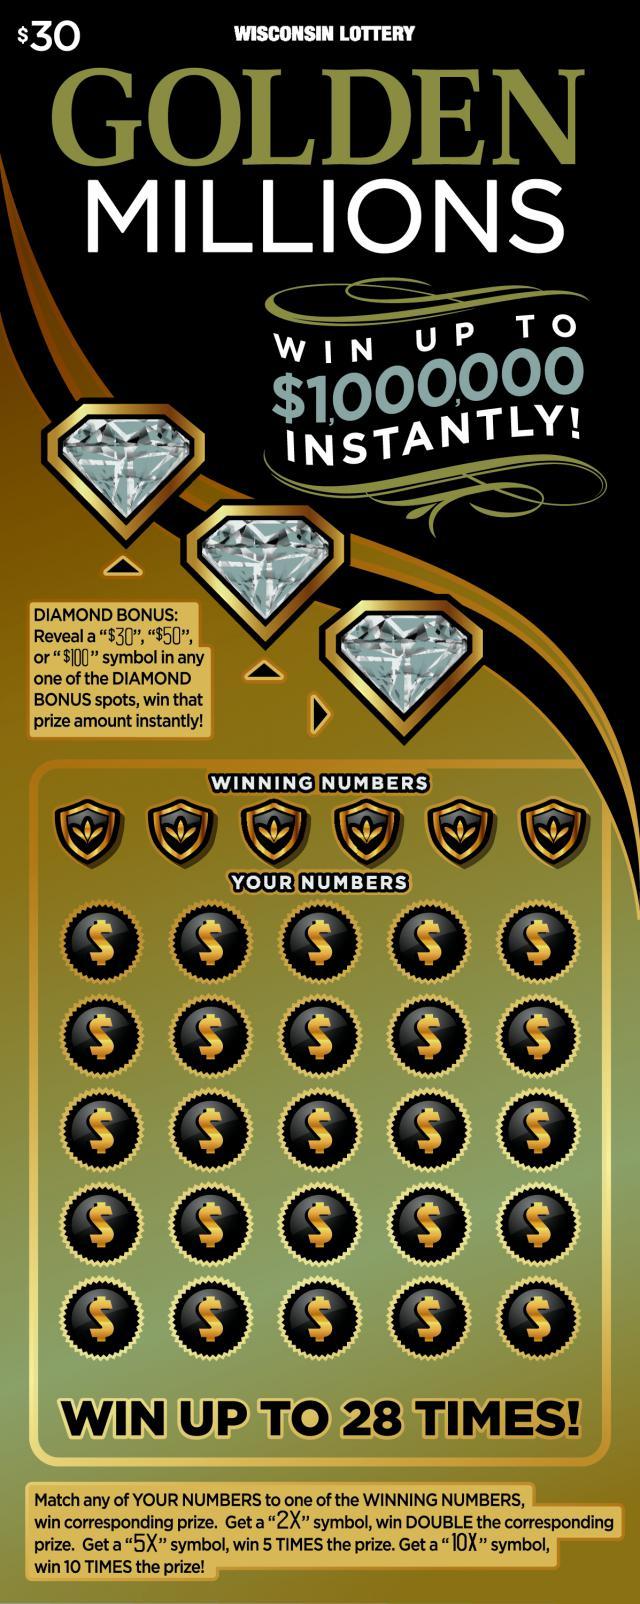 Golden Millions